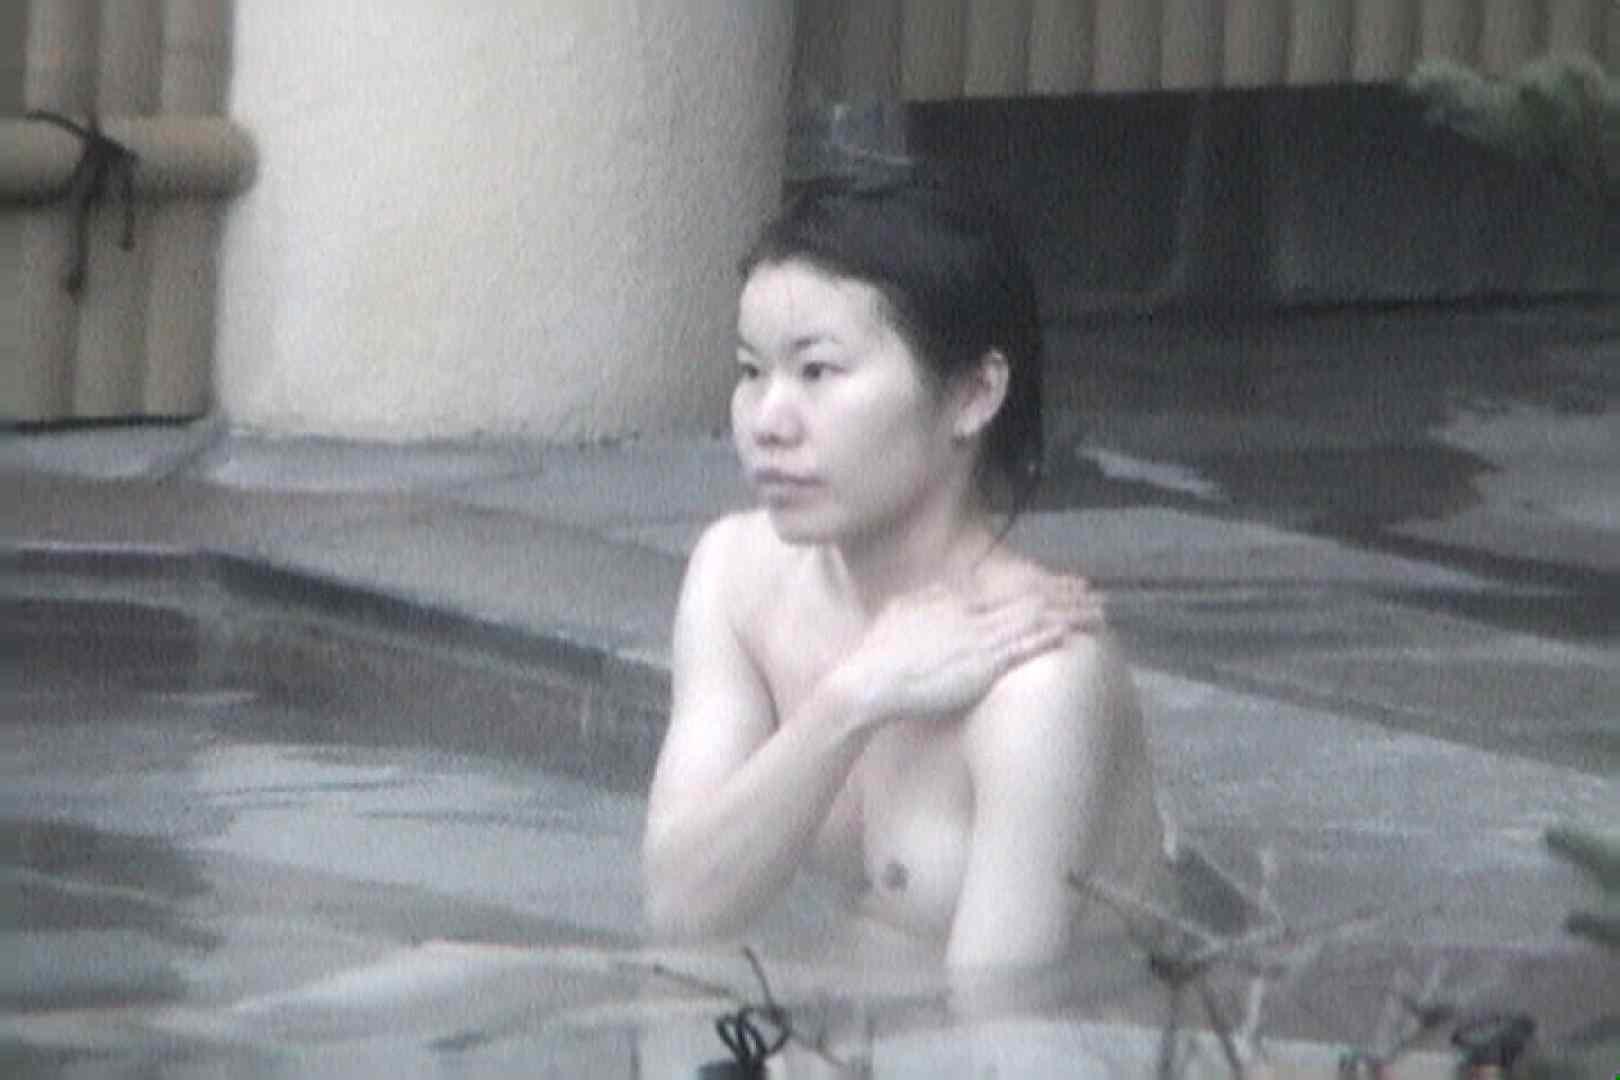 Aquaな露天風呂Vol.556 美しいOLの裸体 すけべAV動画紹介 69pic 32